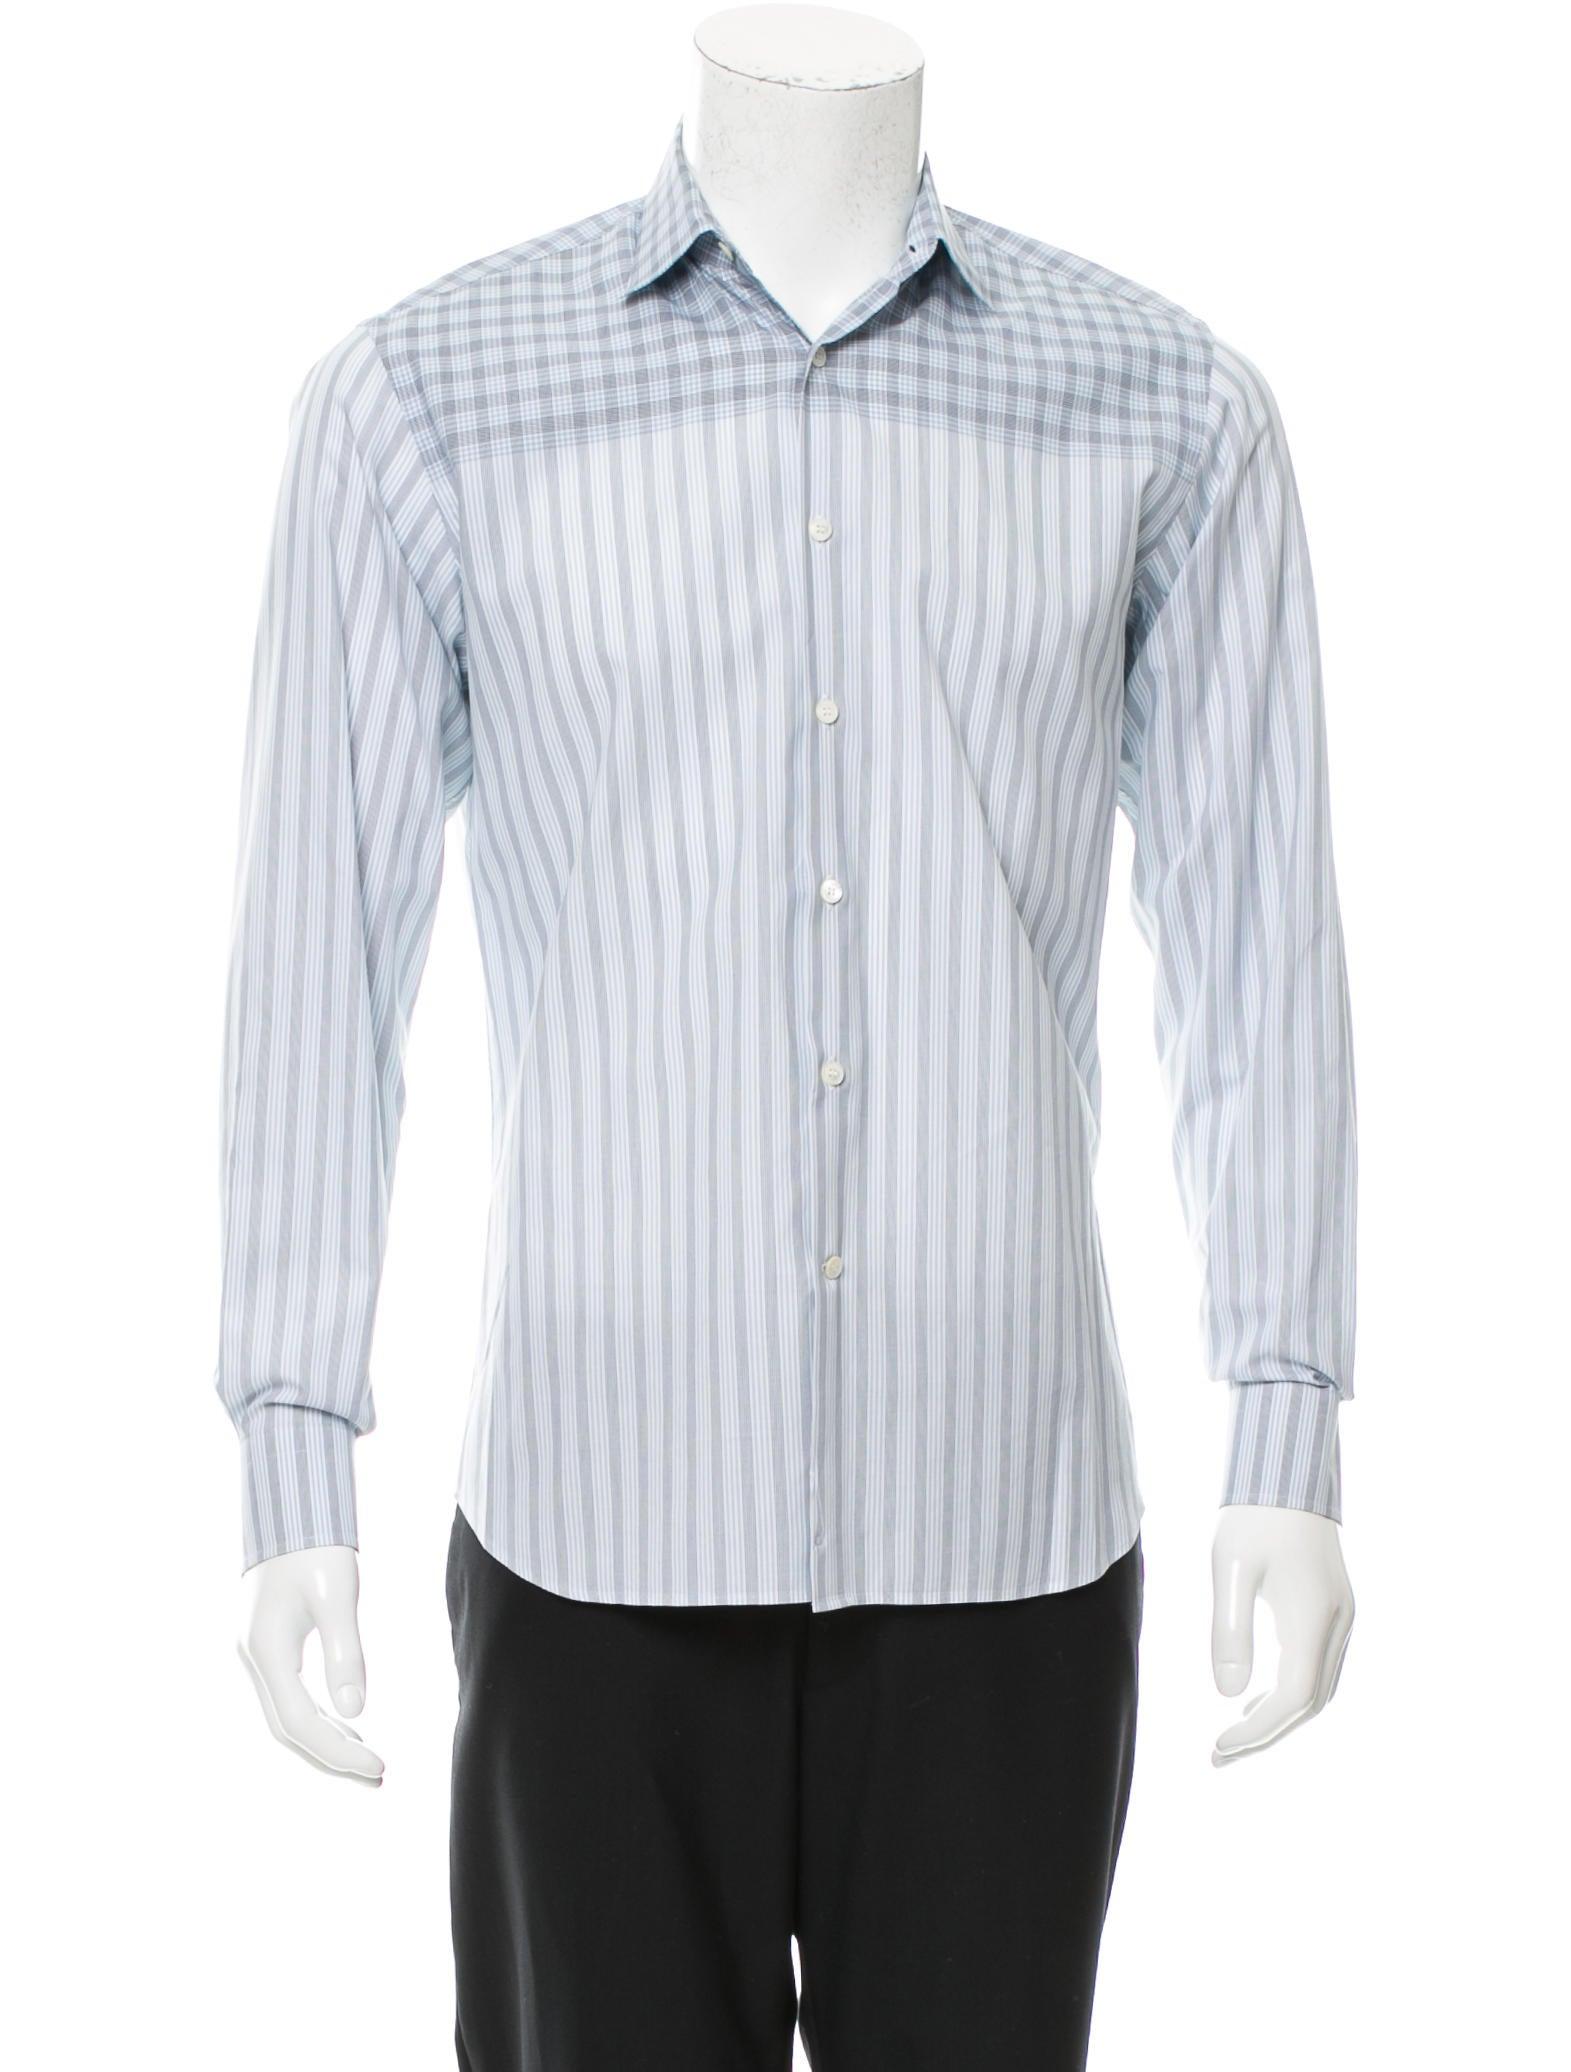 Salvatore Ferragamo Woven Printed Shirt - Clothing ...